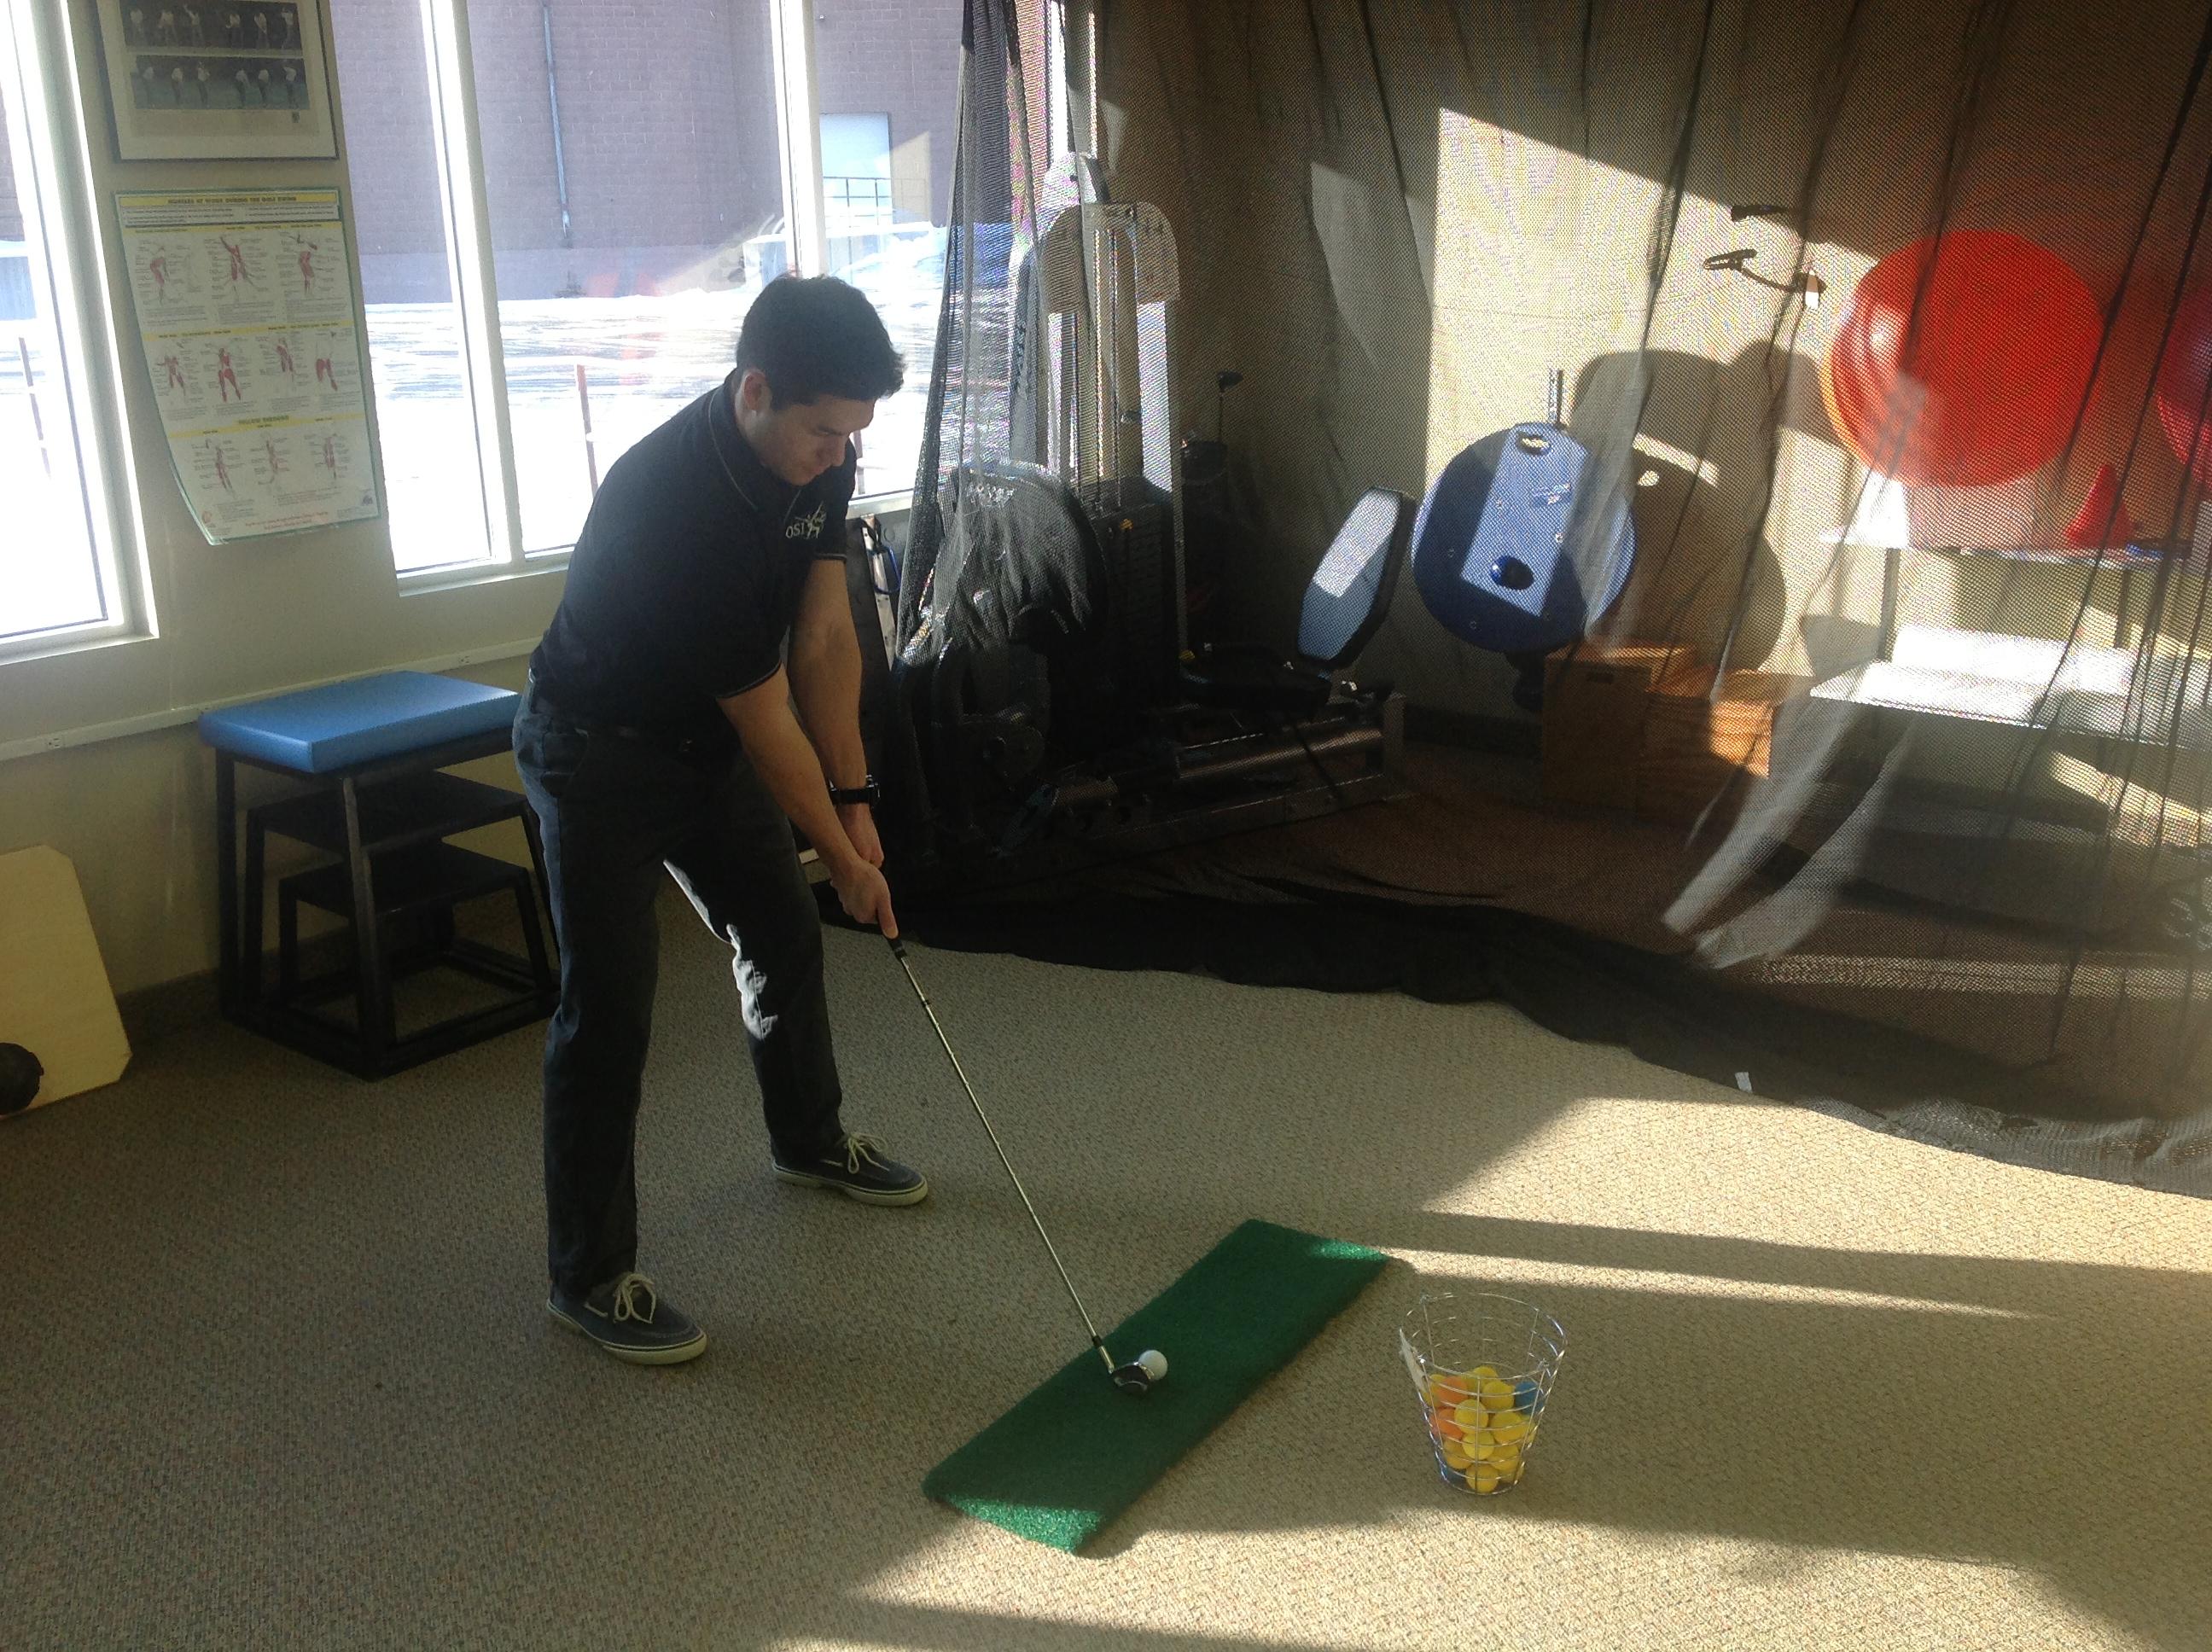 Video analysis of golf swing mechanics